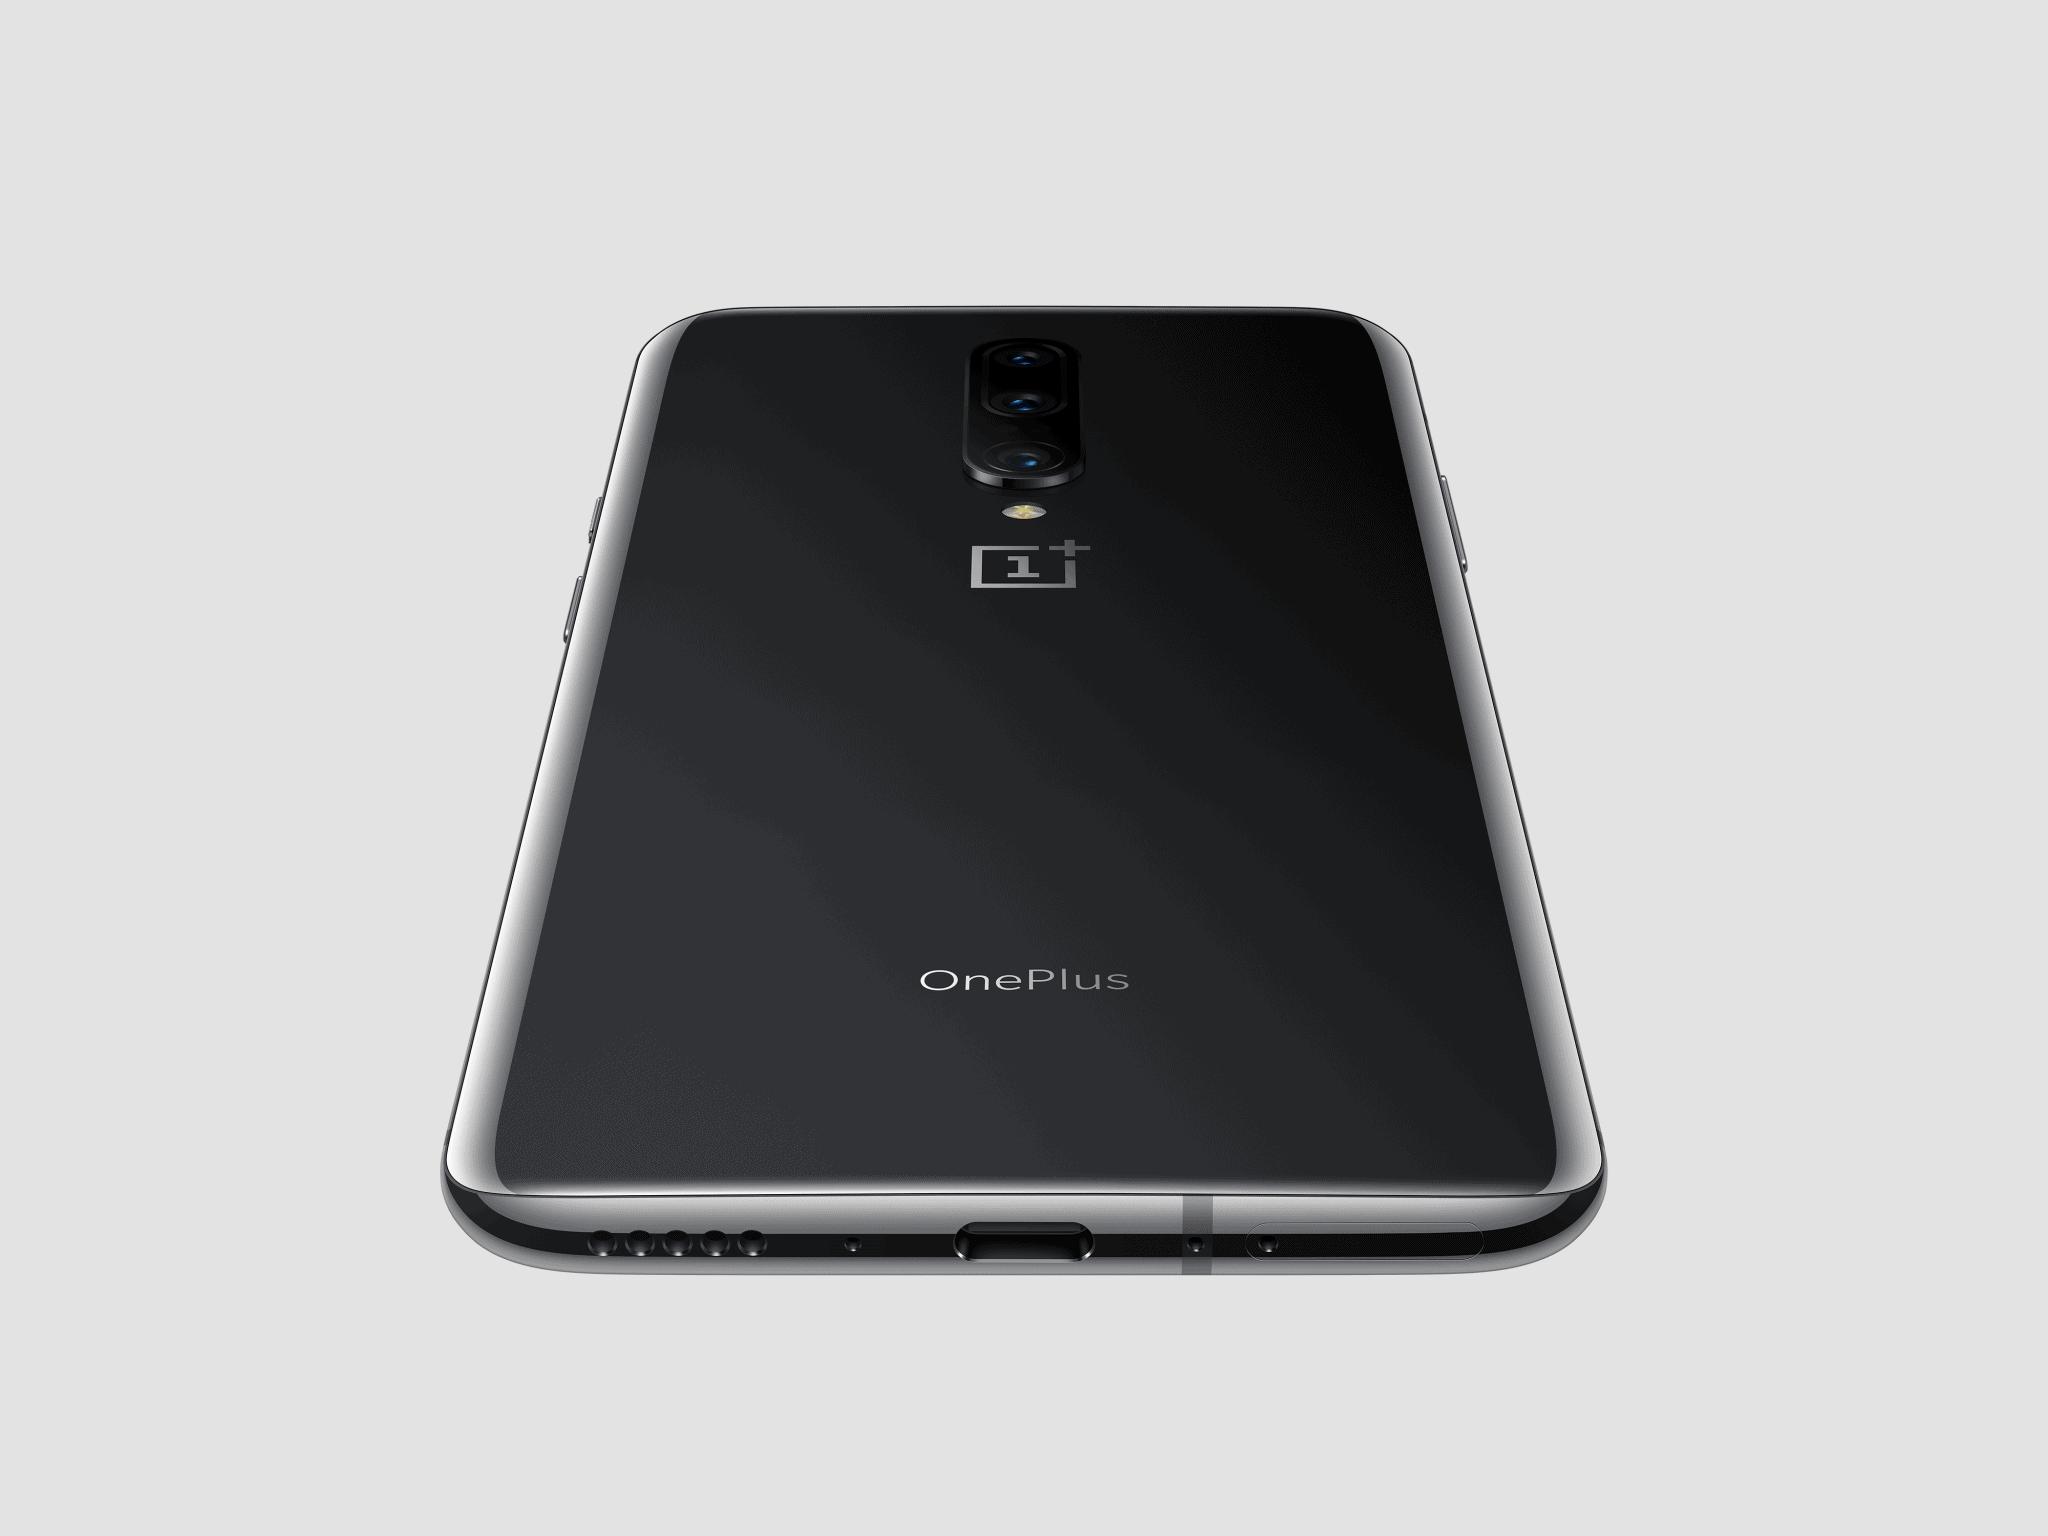 OnePlus 7 Pro - 6